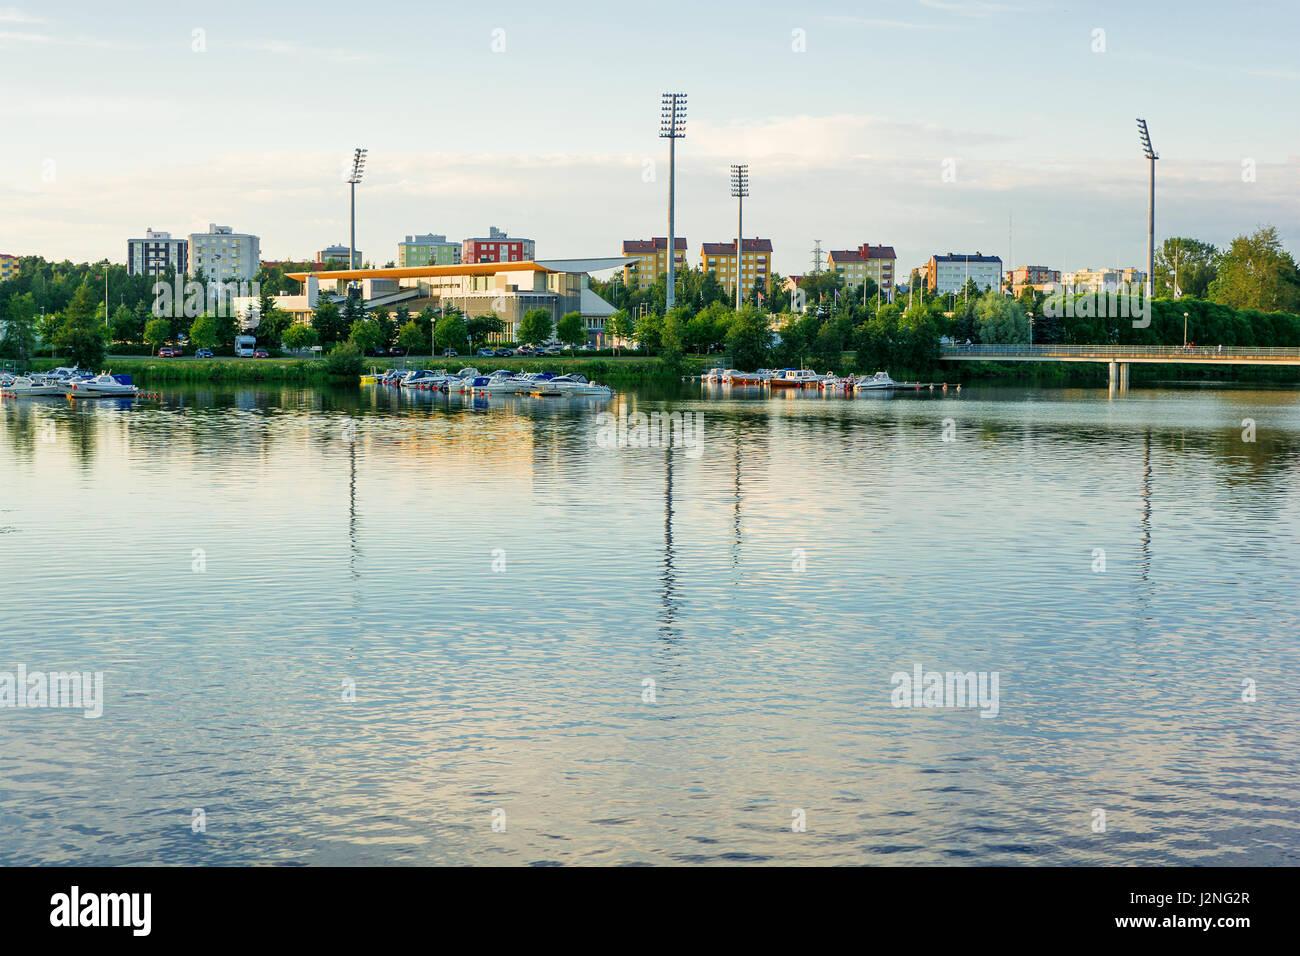 Cityscape of Oulu (Finland) - Stock Image